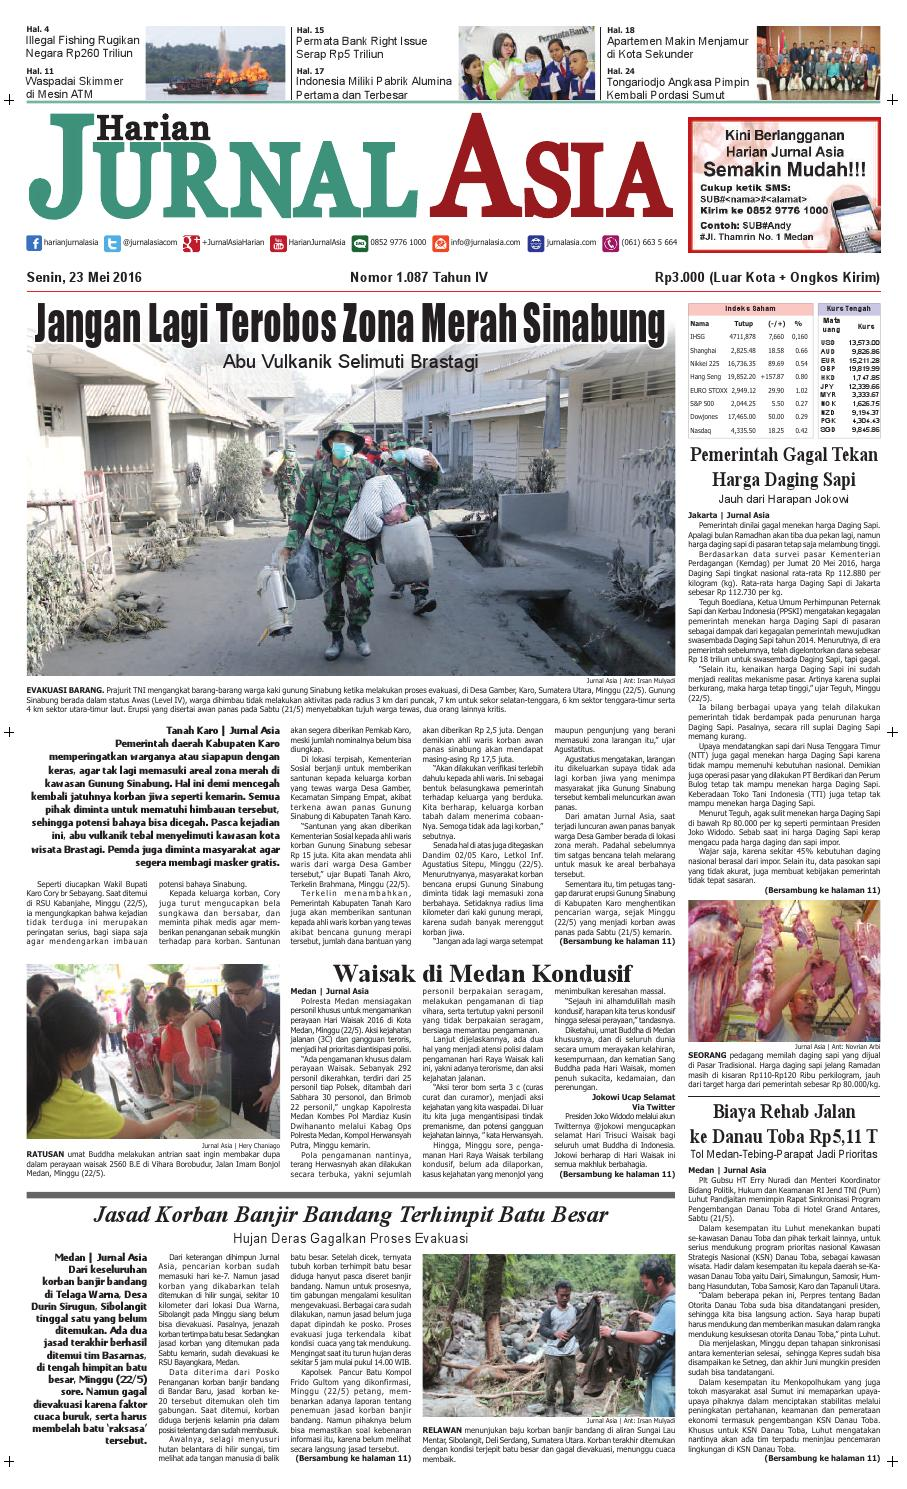 Harian Jurnal Asia Edisi Senin 23 Mei 2016 By Produk Ukm Bumn Kain Batik Eksklusif Lasem Manuk Medan Issuu